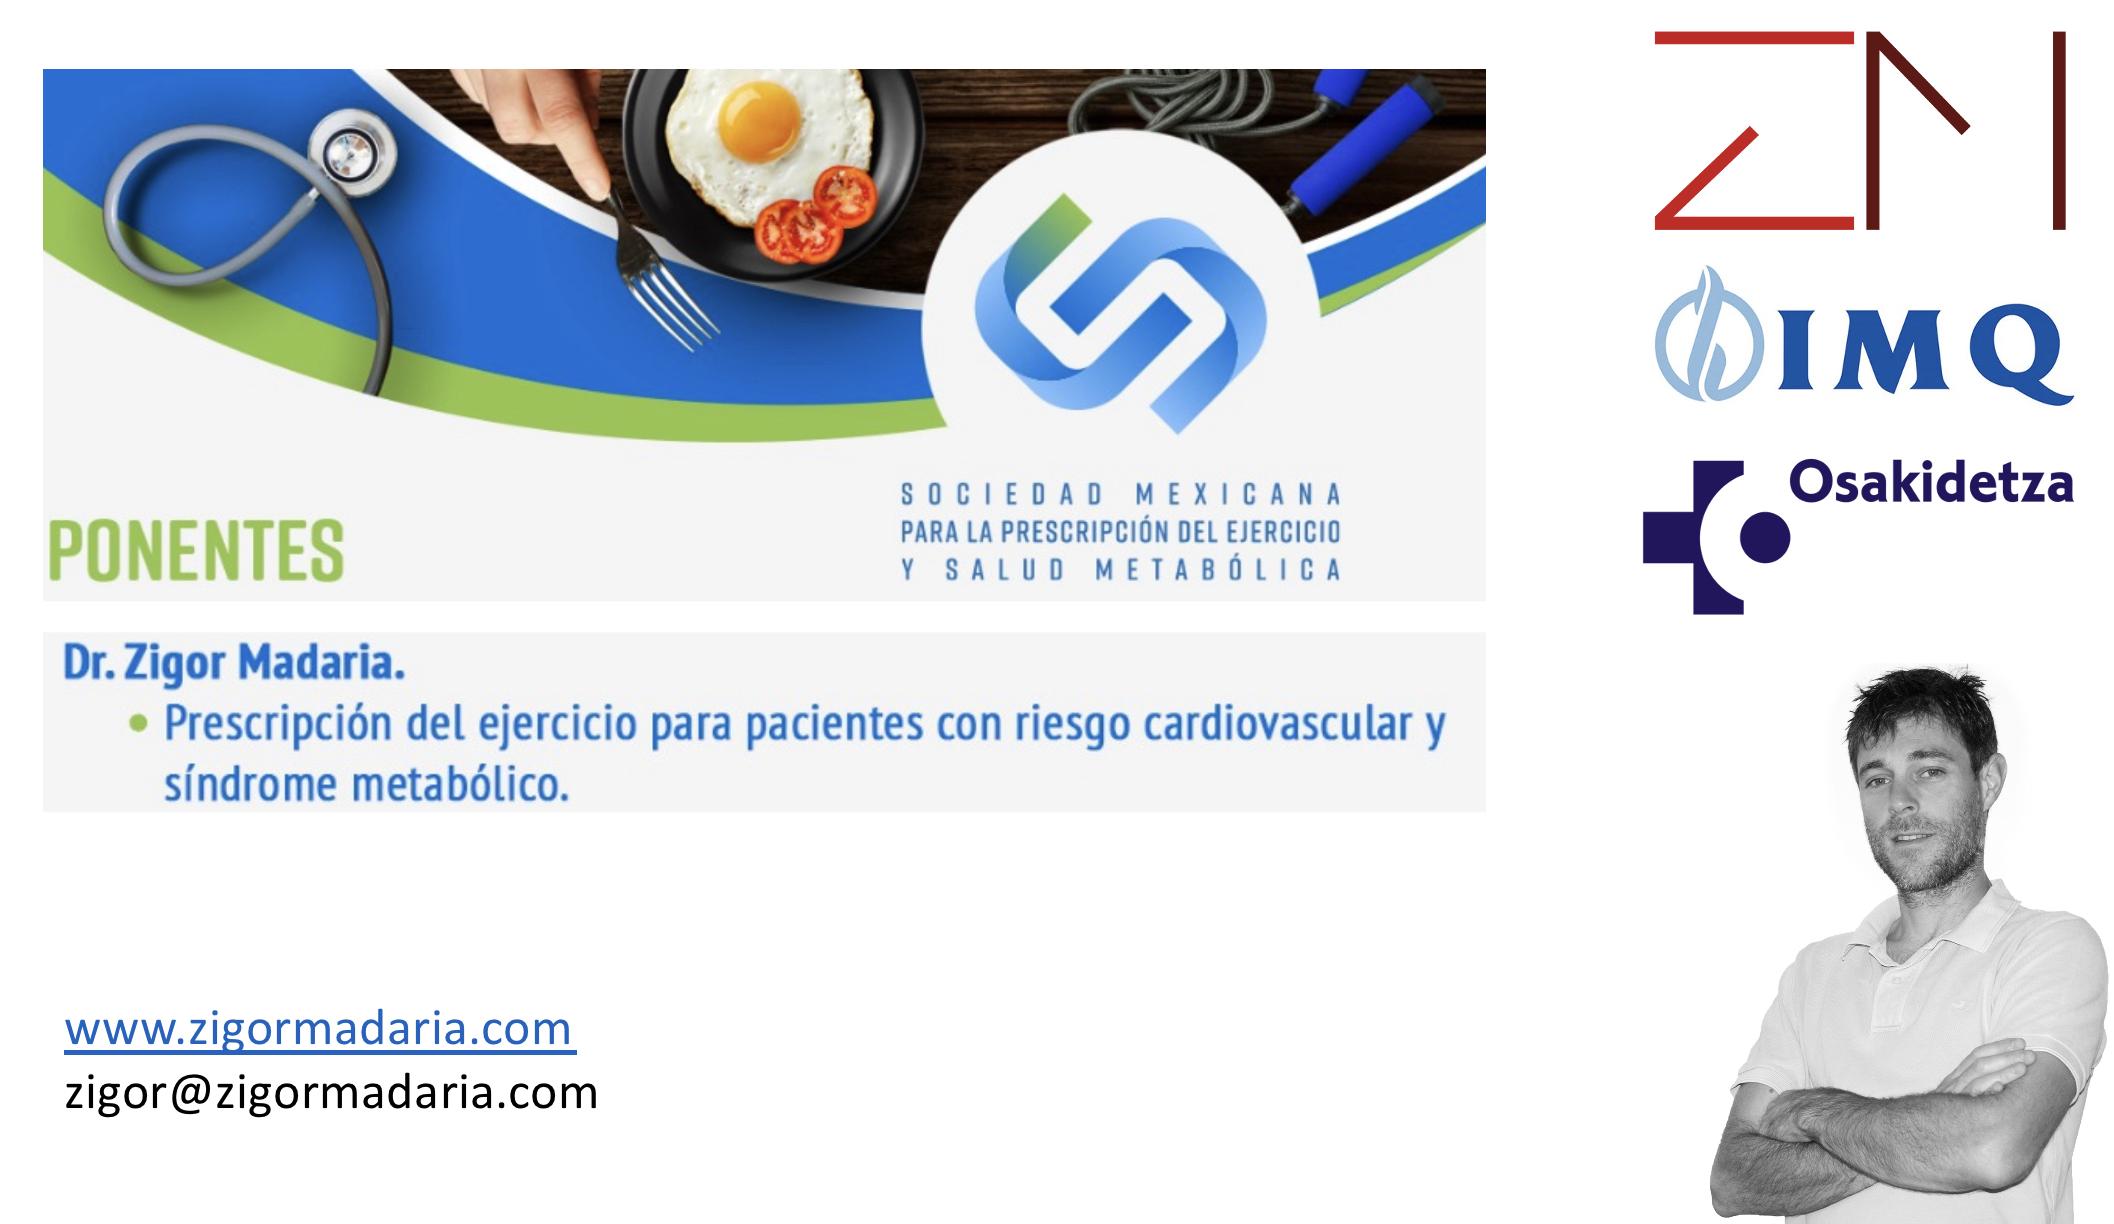 Prescripción de ejercicio cardiopatías